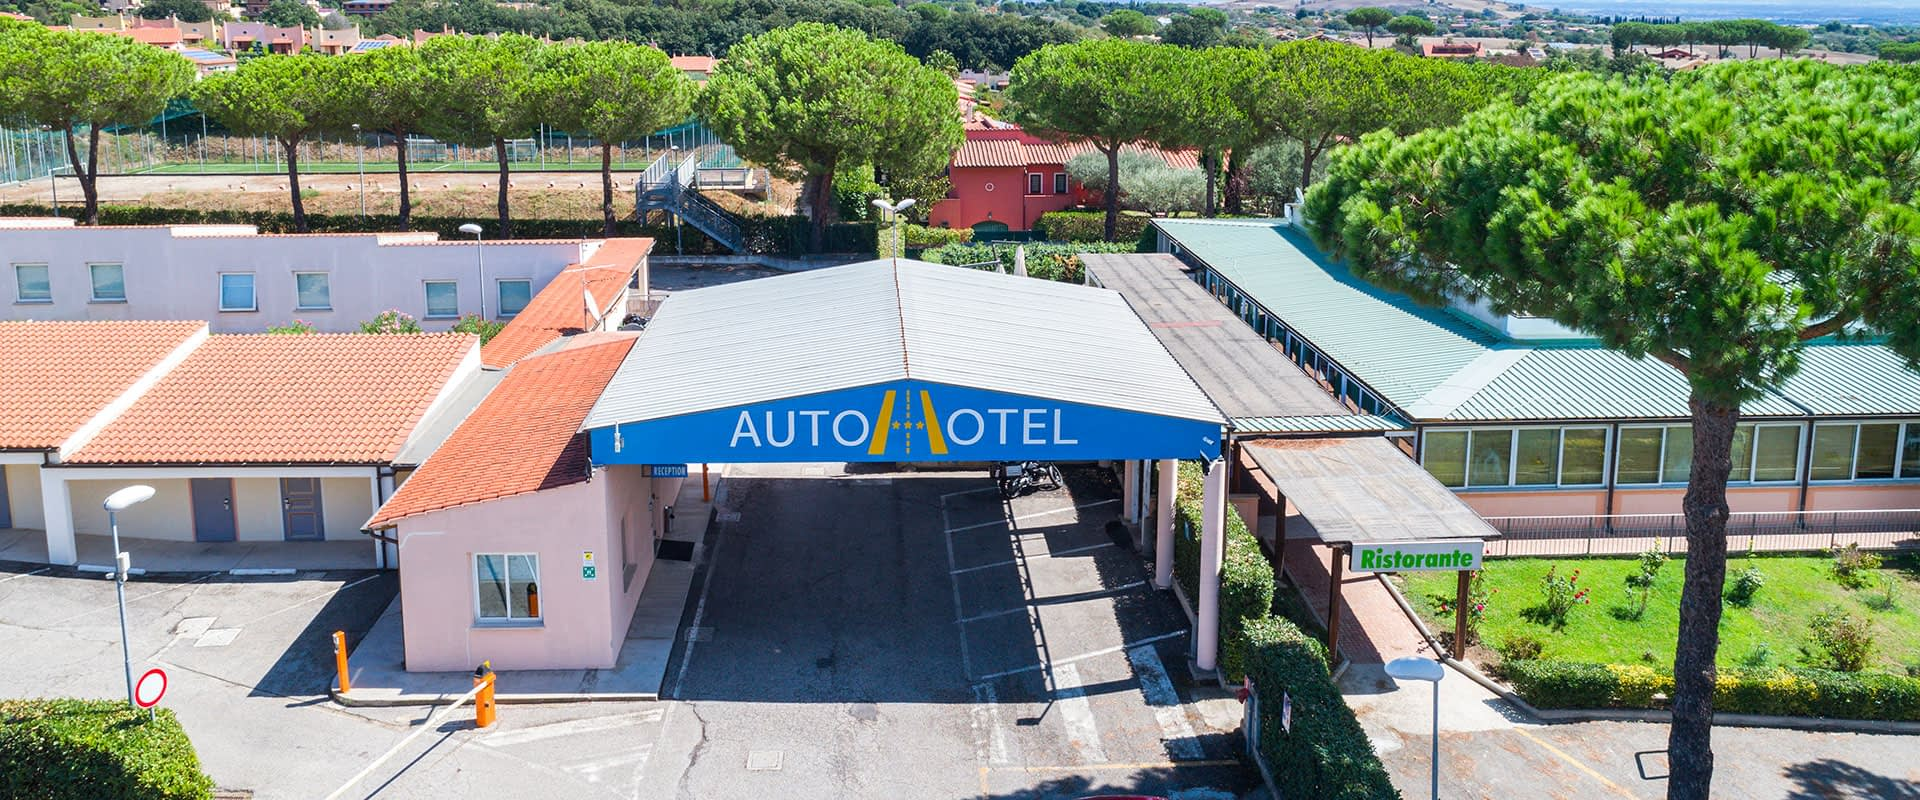 Autohotel Roma Ingresso